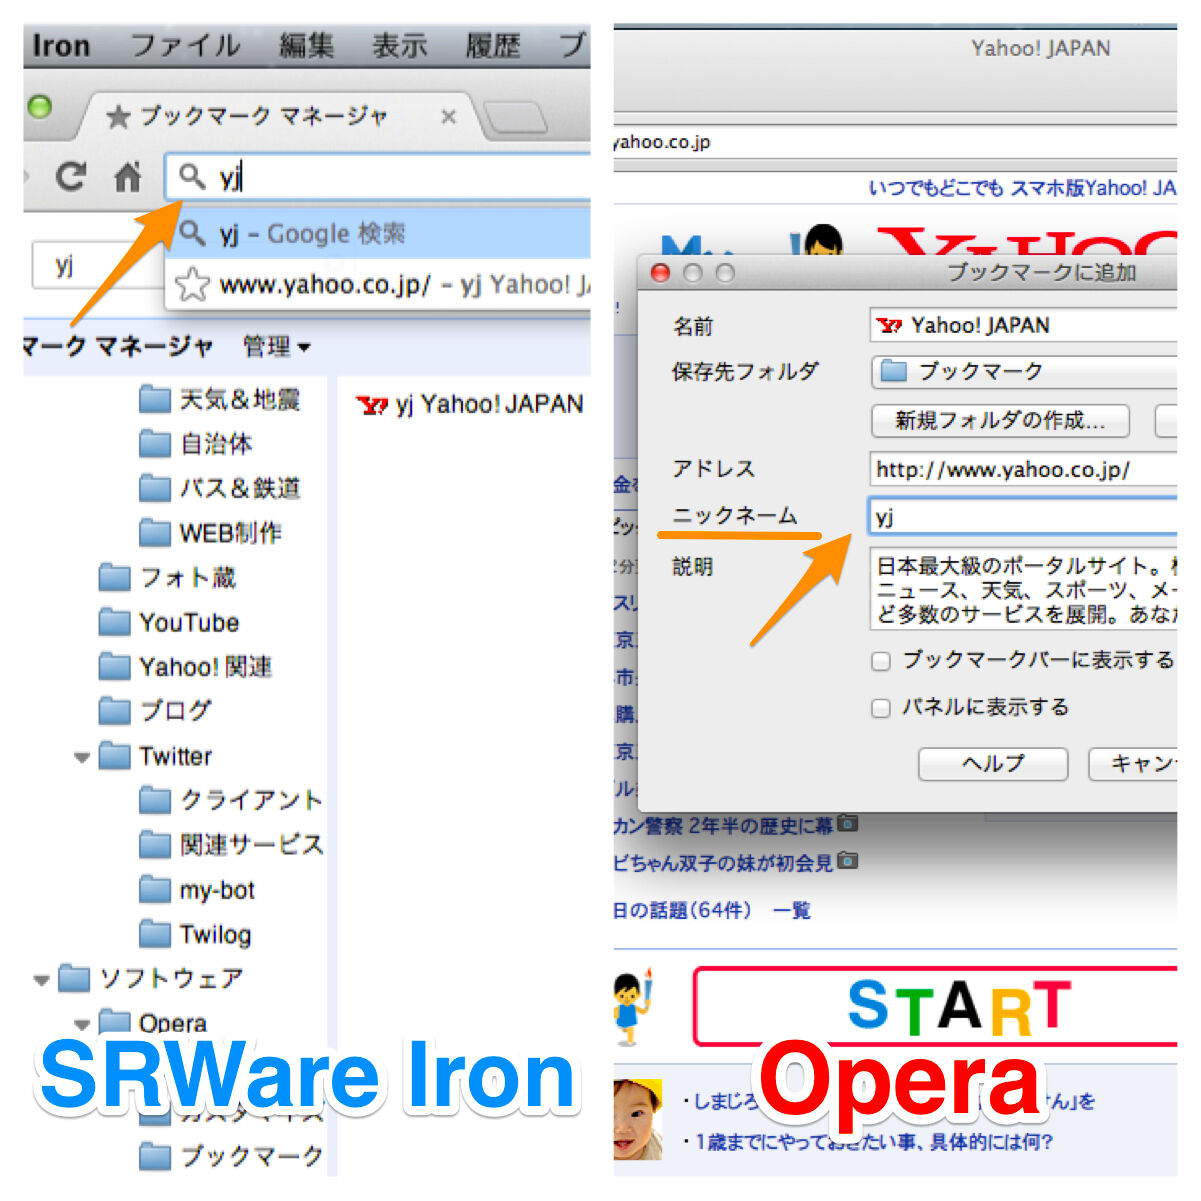 SRWare Ironで模したOpera「ニックネーム」機能と、Operaのブックマーク追加ダイアログ - 4